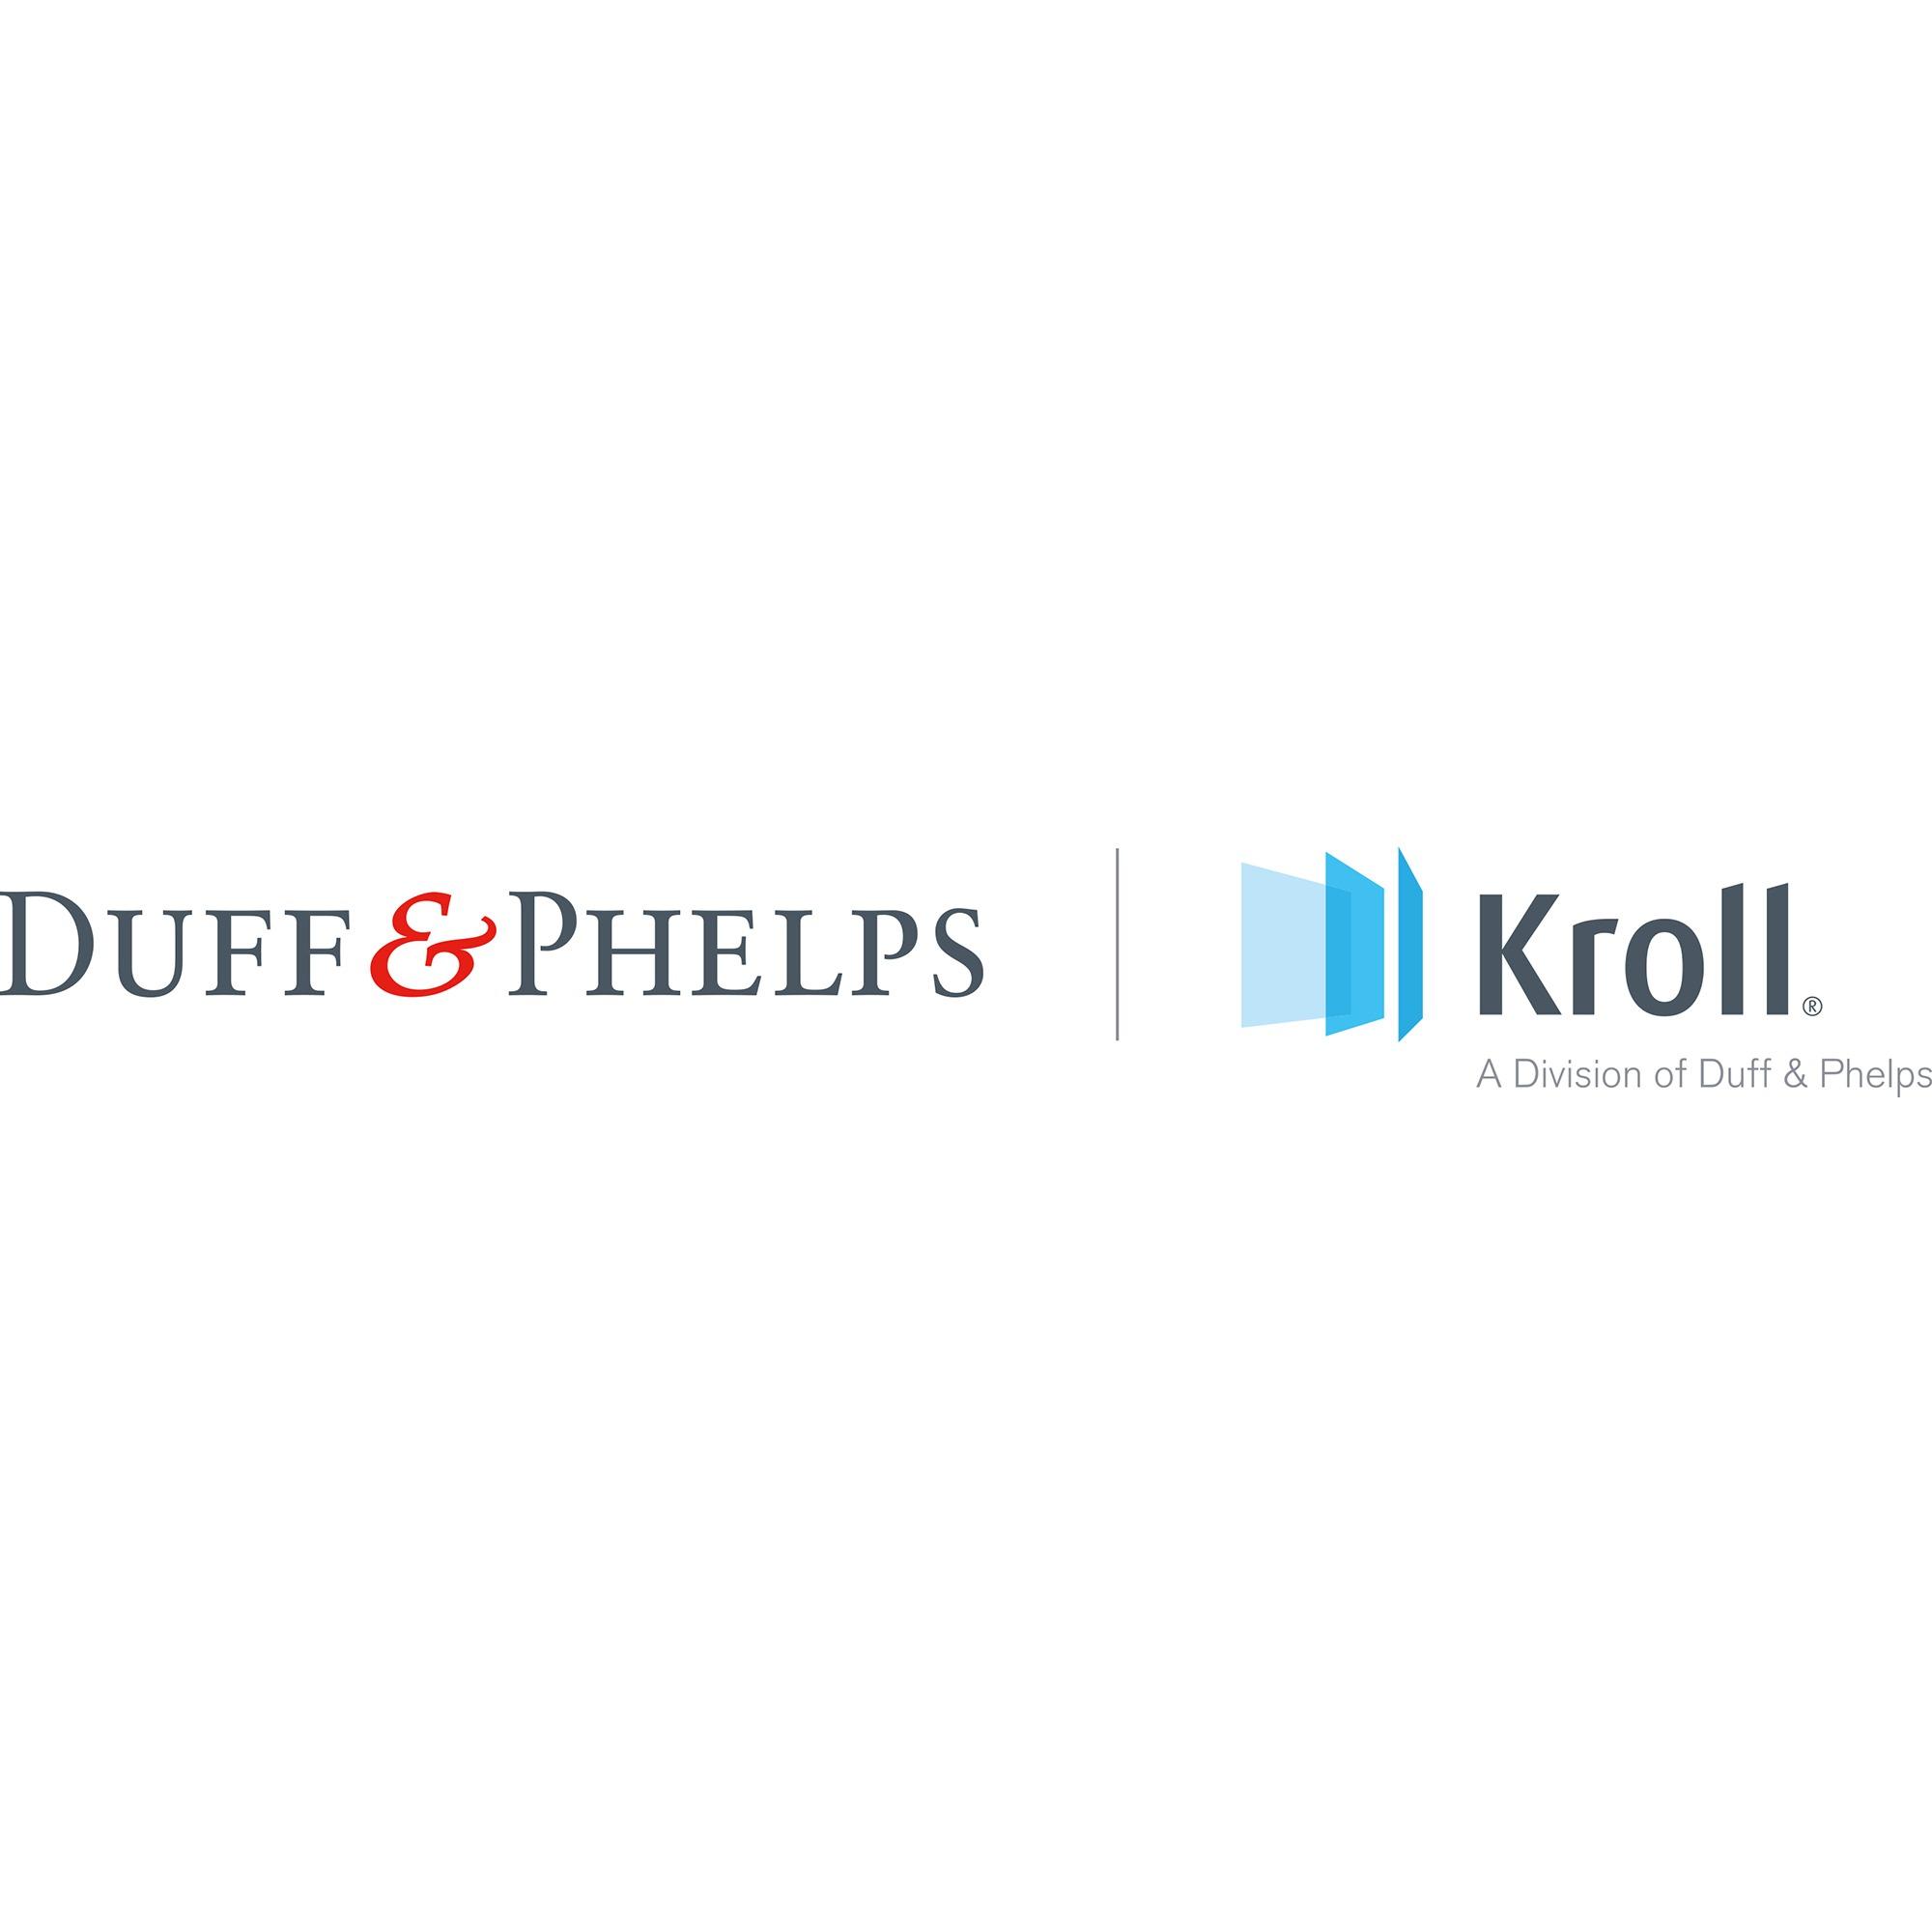 the Duff & Phelps Kroll logo.